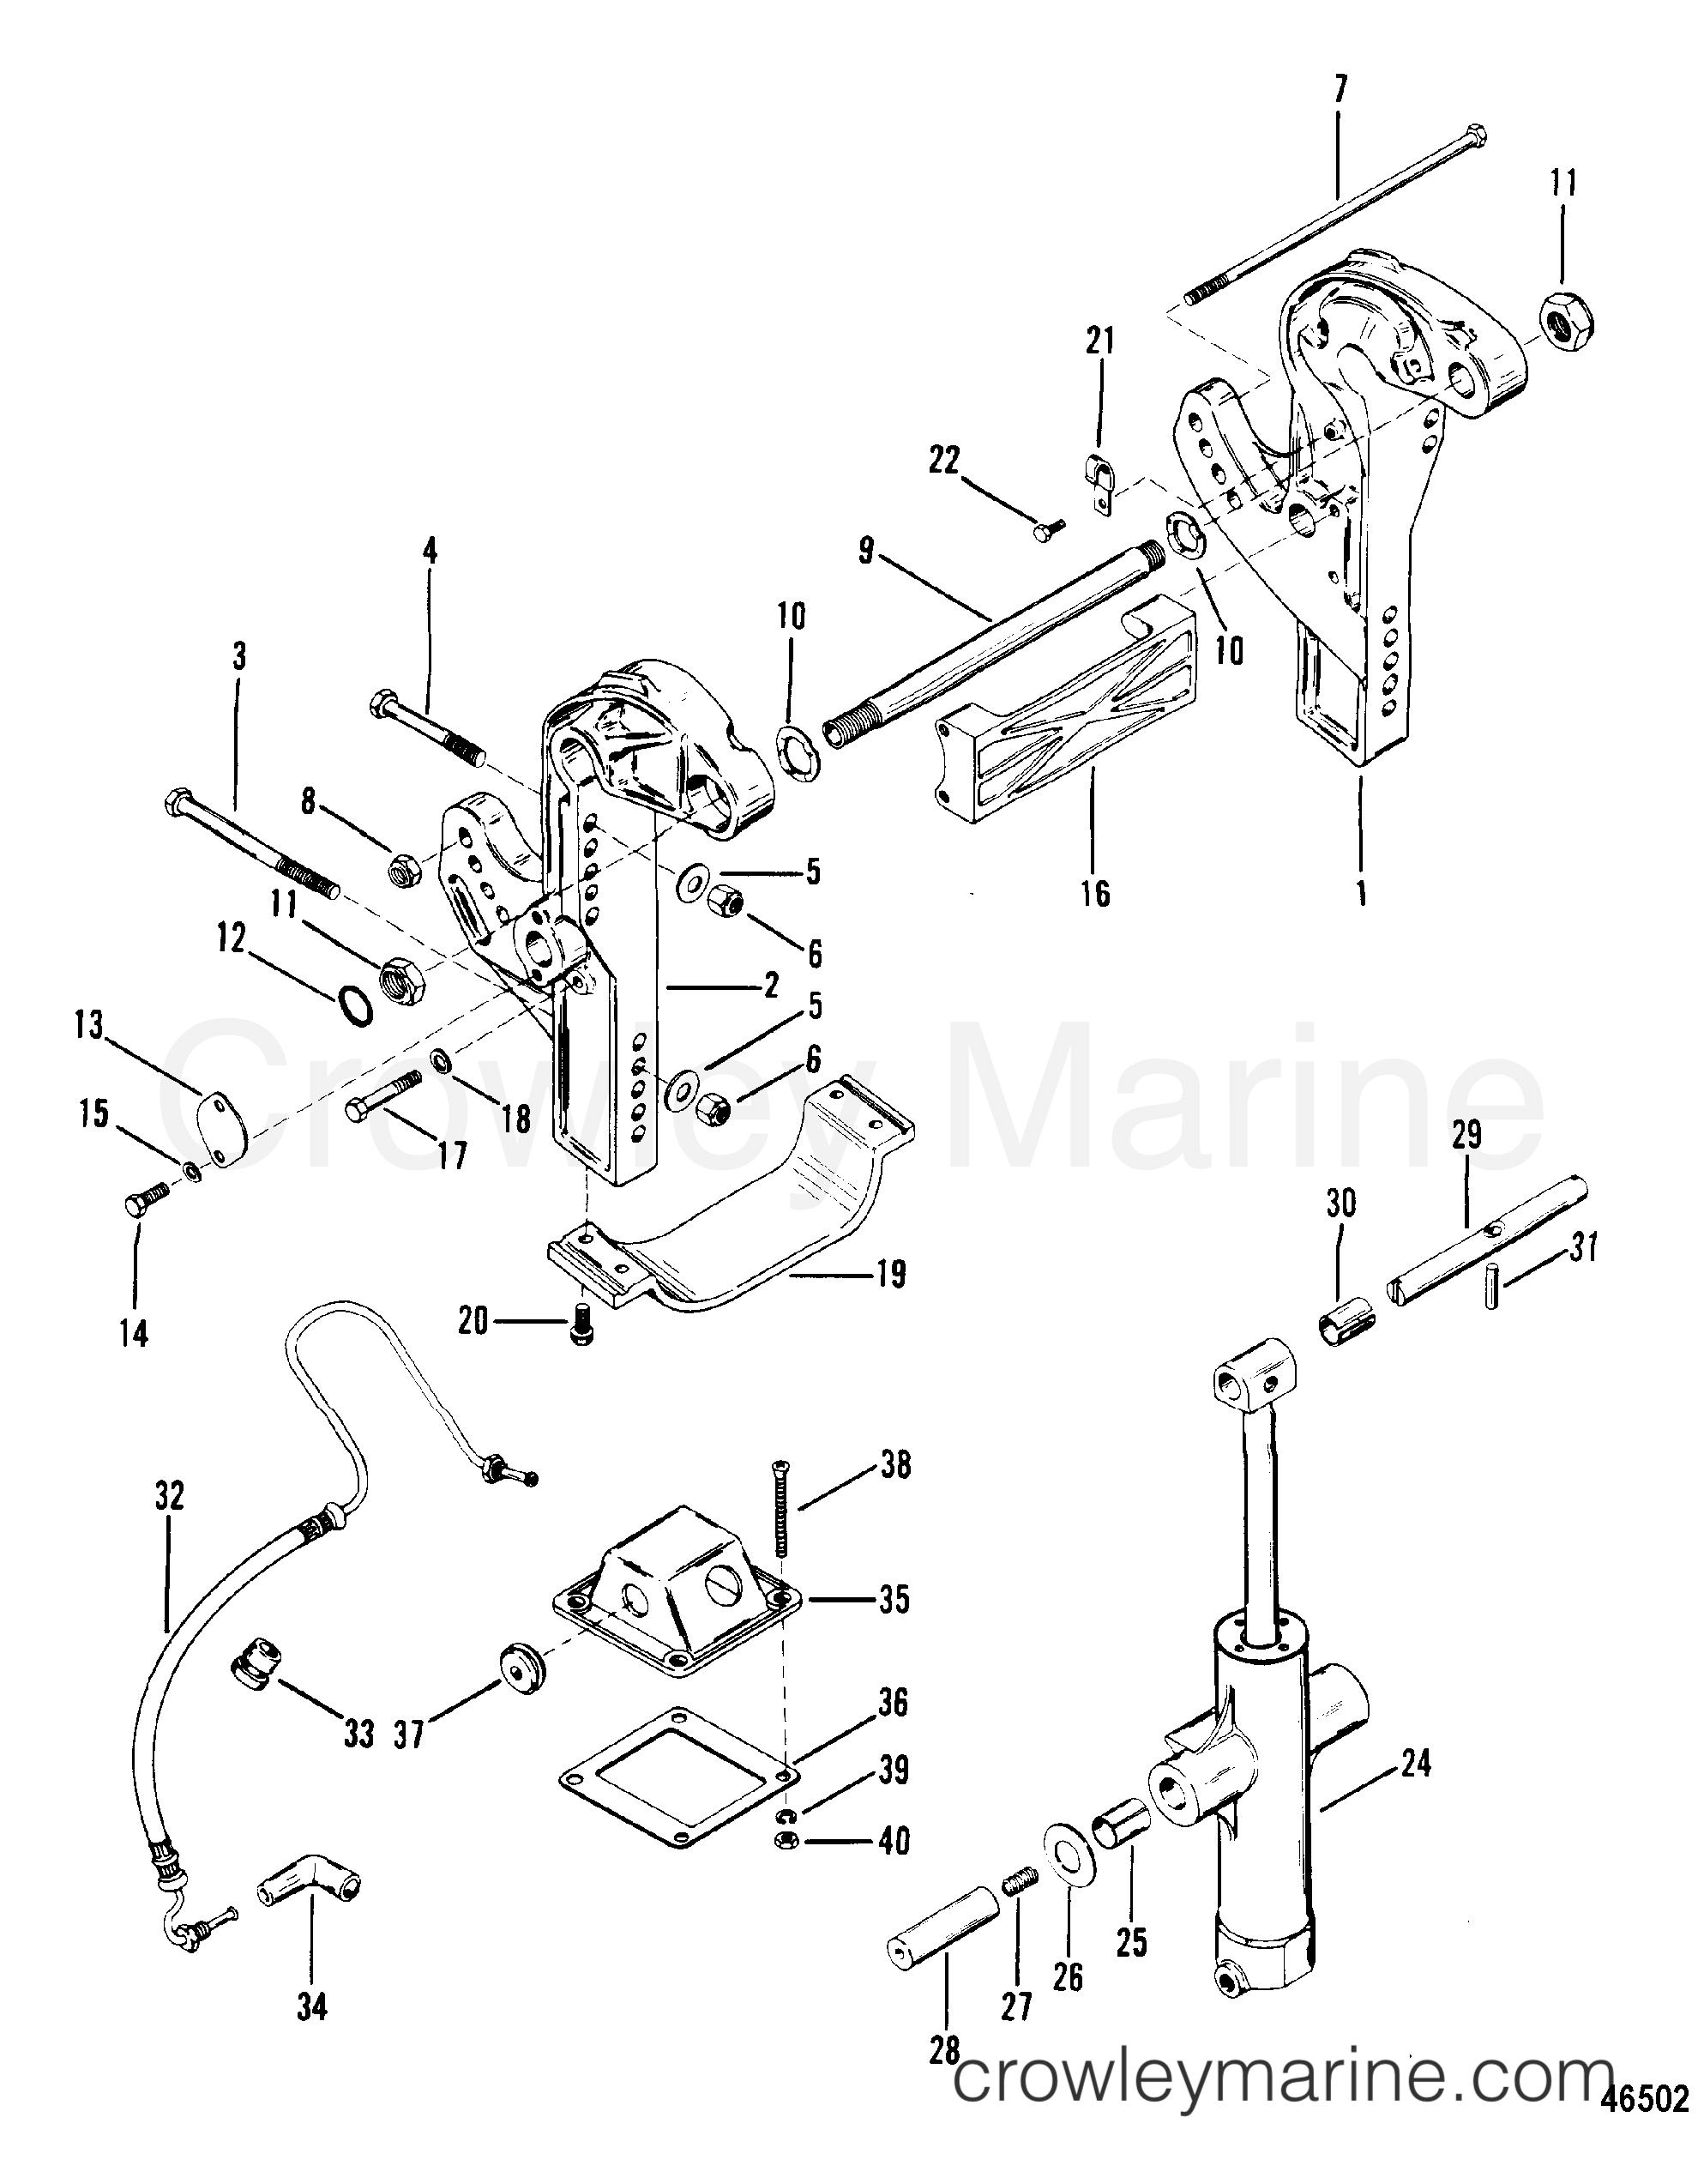 1983 Mercury Outboard 300 [ELPT] - 1300623 - TRANSOM BRACKETS section